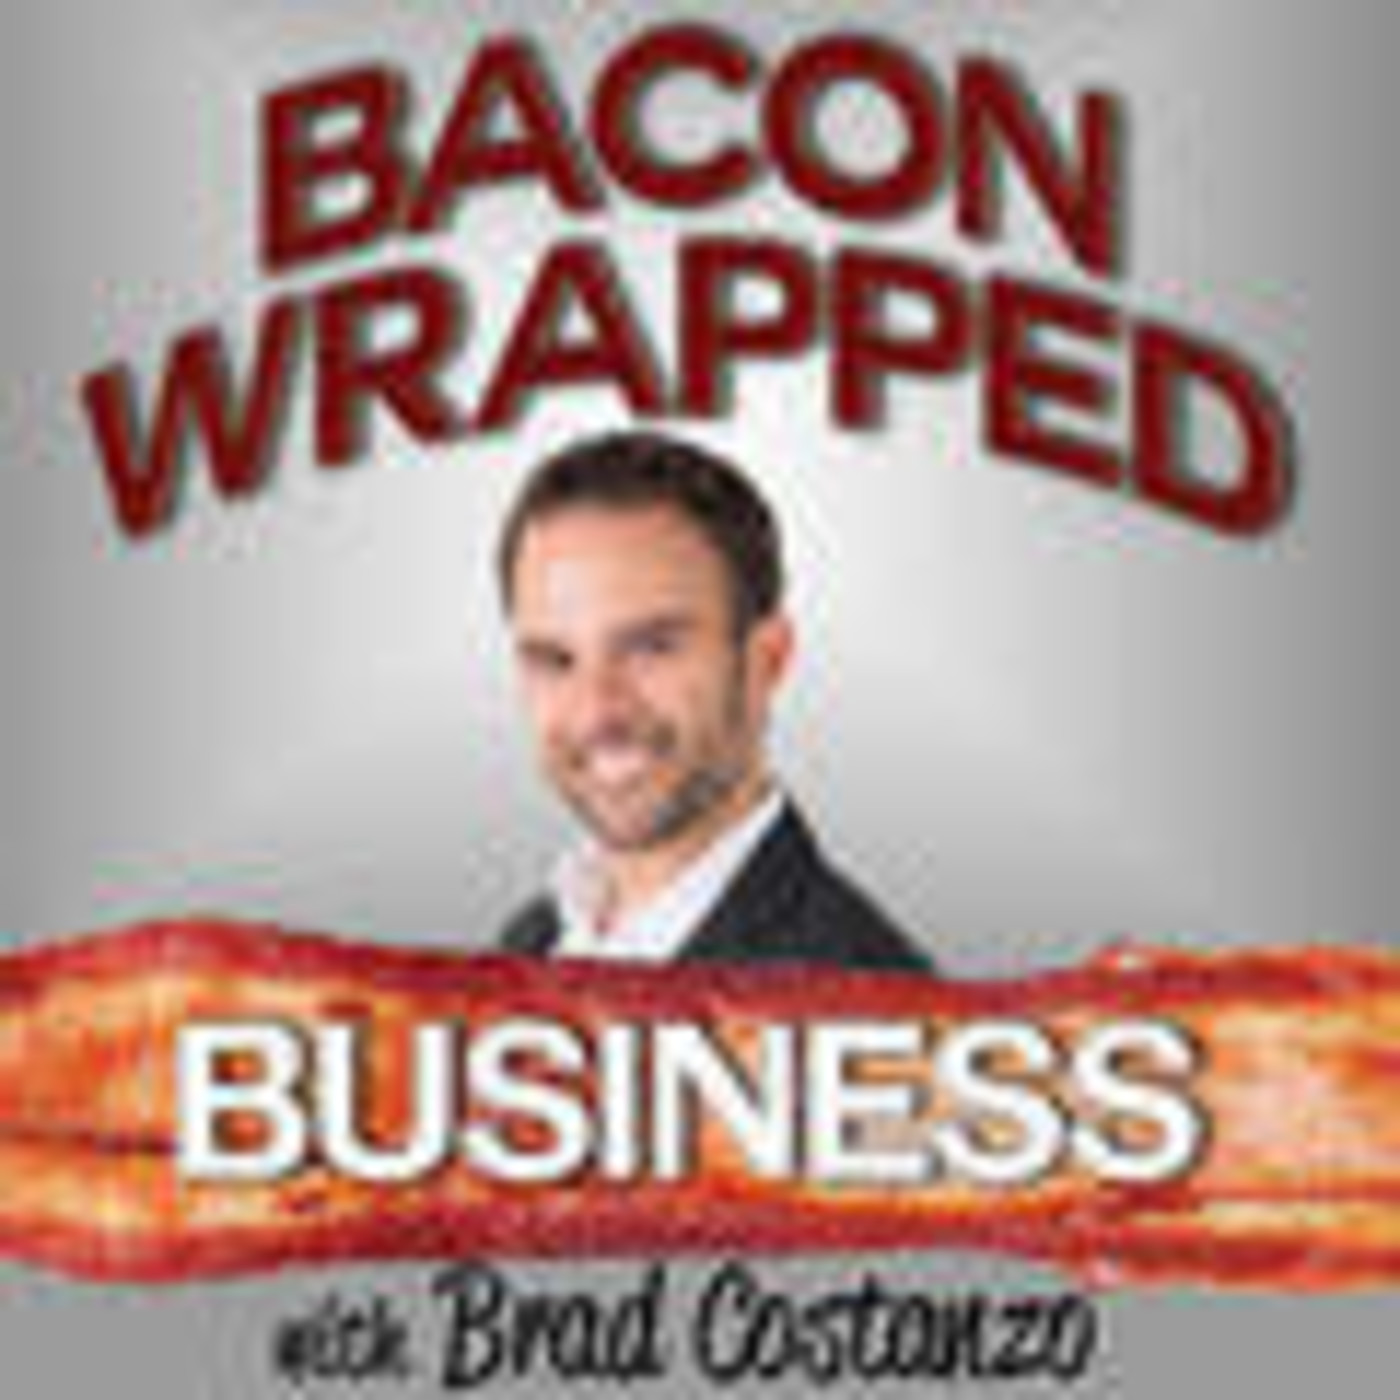 Brad Costanzo:  Business Growt